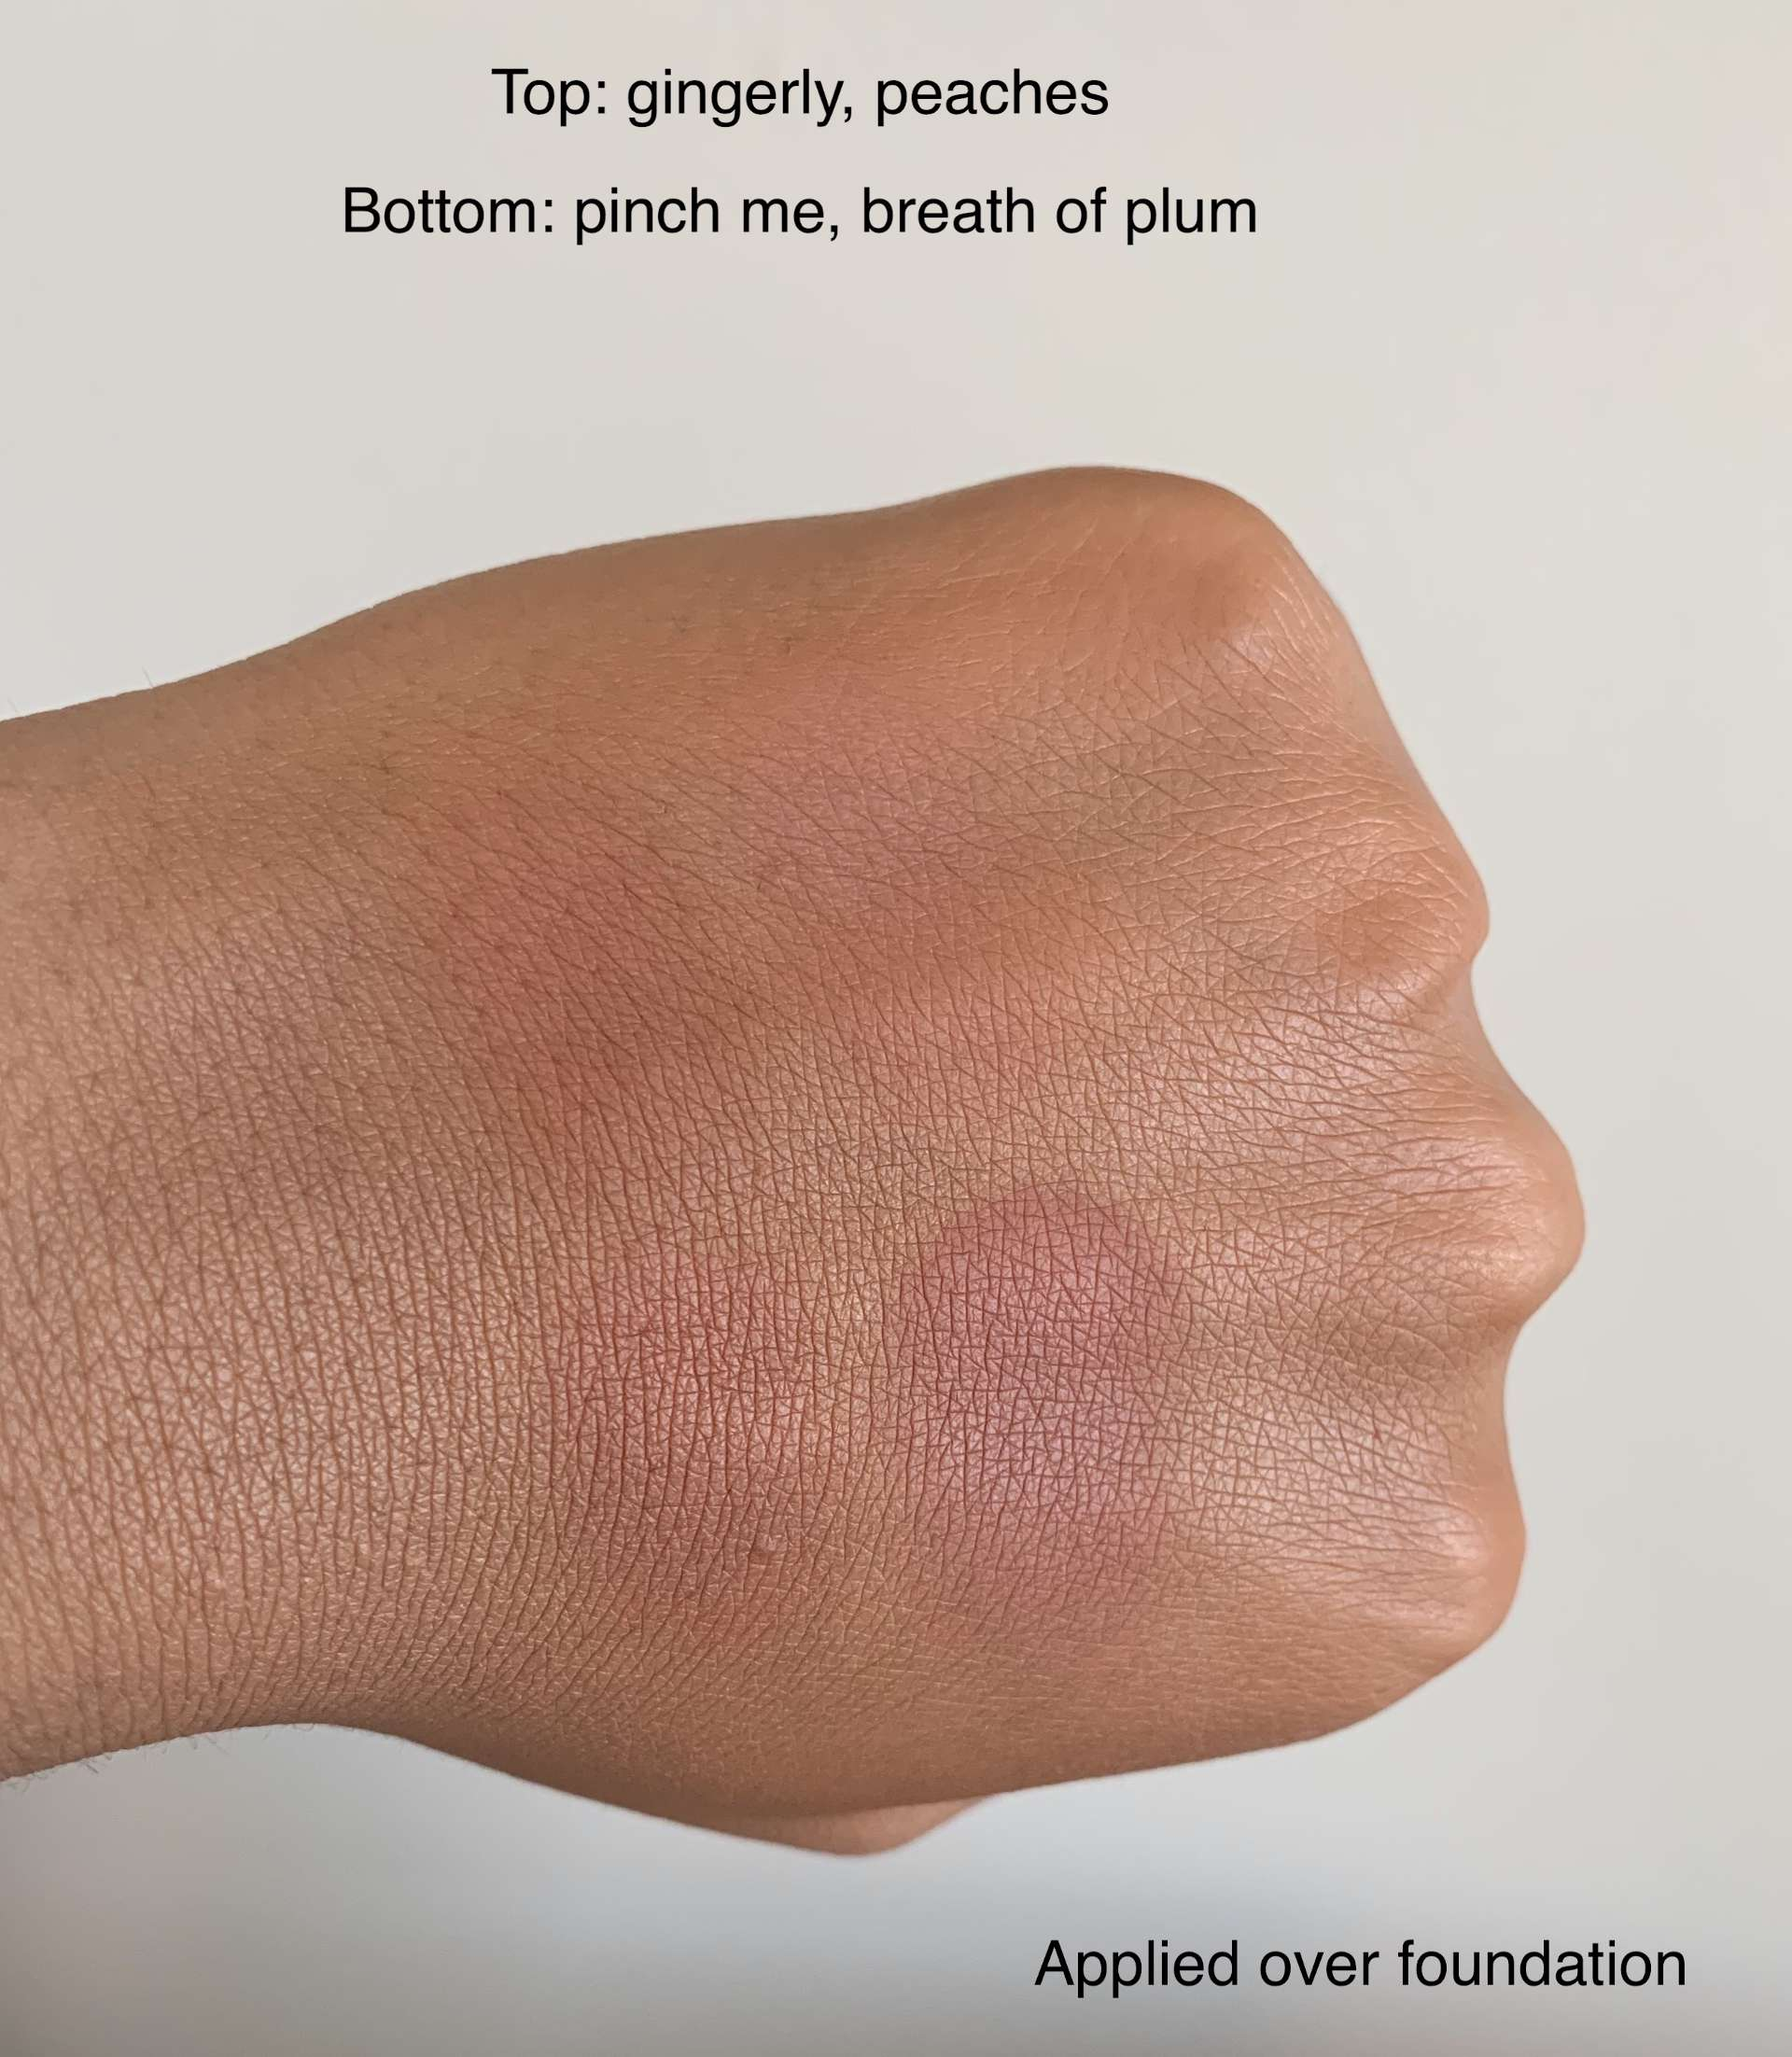 MAC Sheertone Blush (gingerly, peaches, pinch me, breath of plum) swatches on dark skin